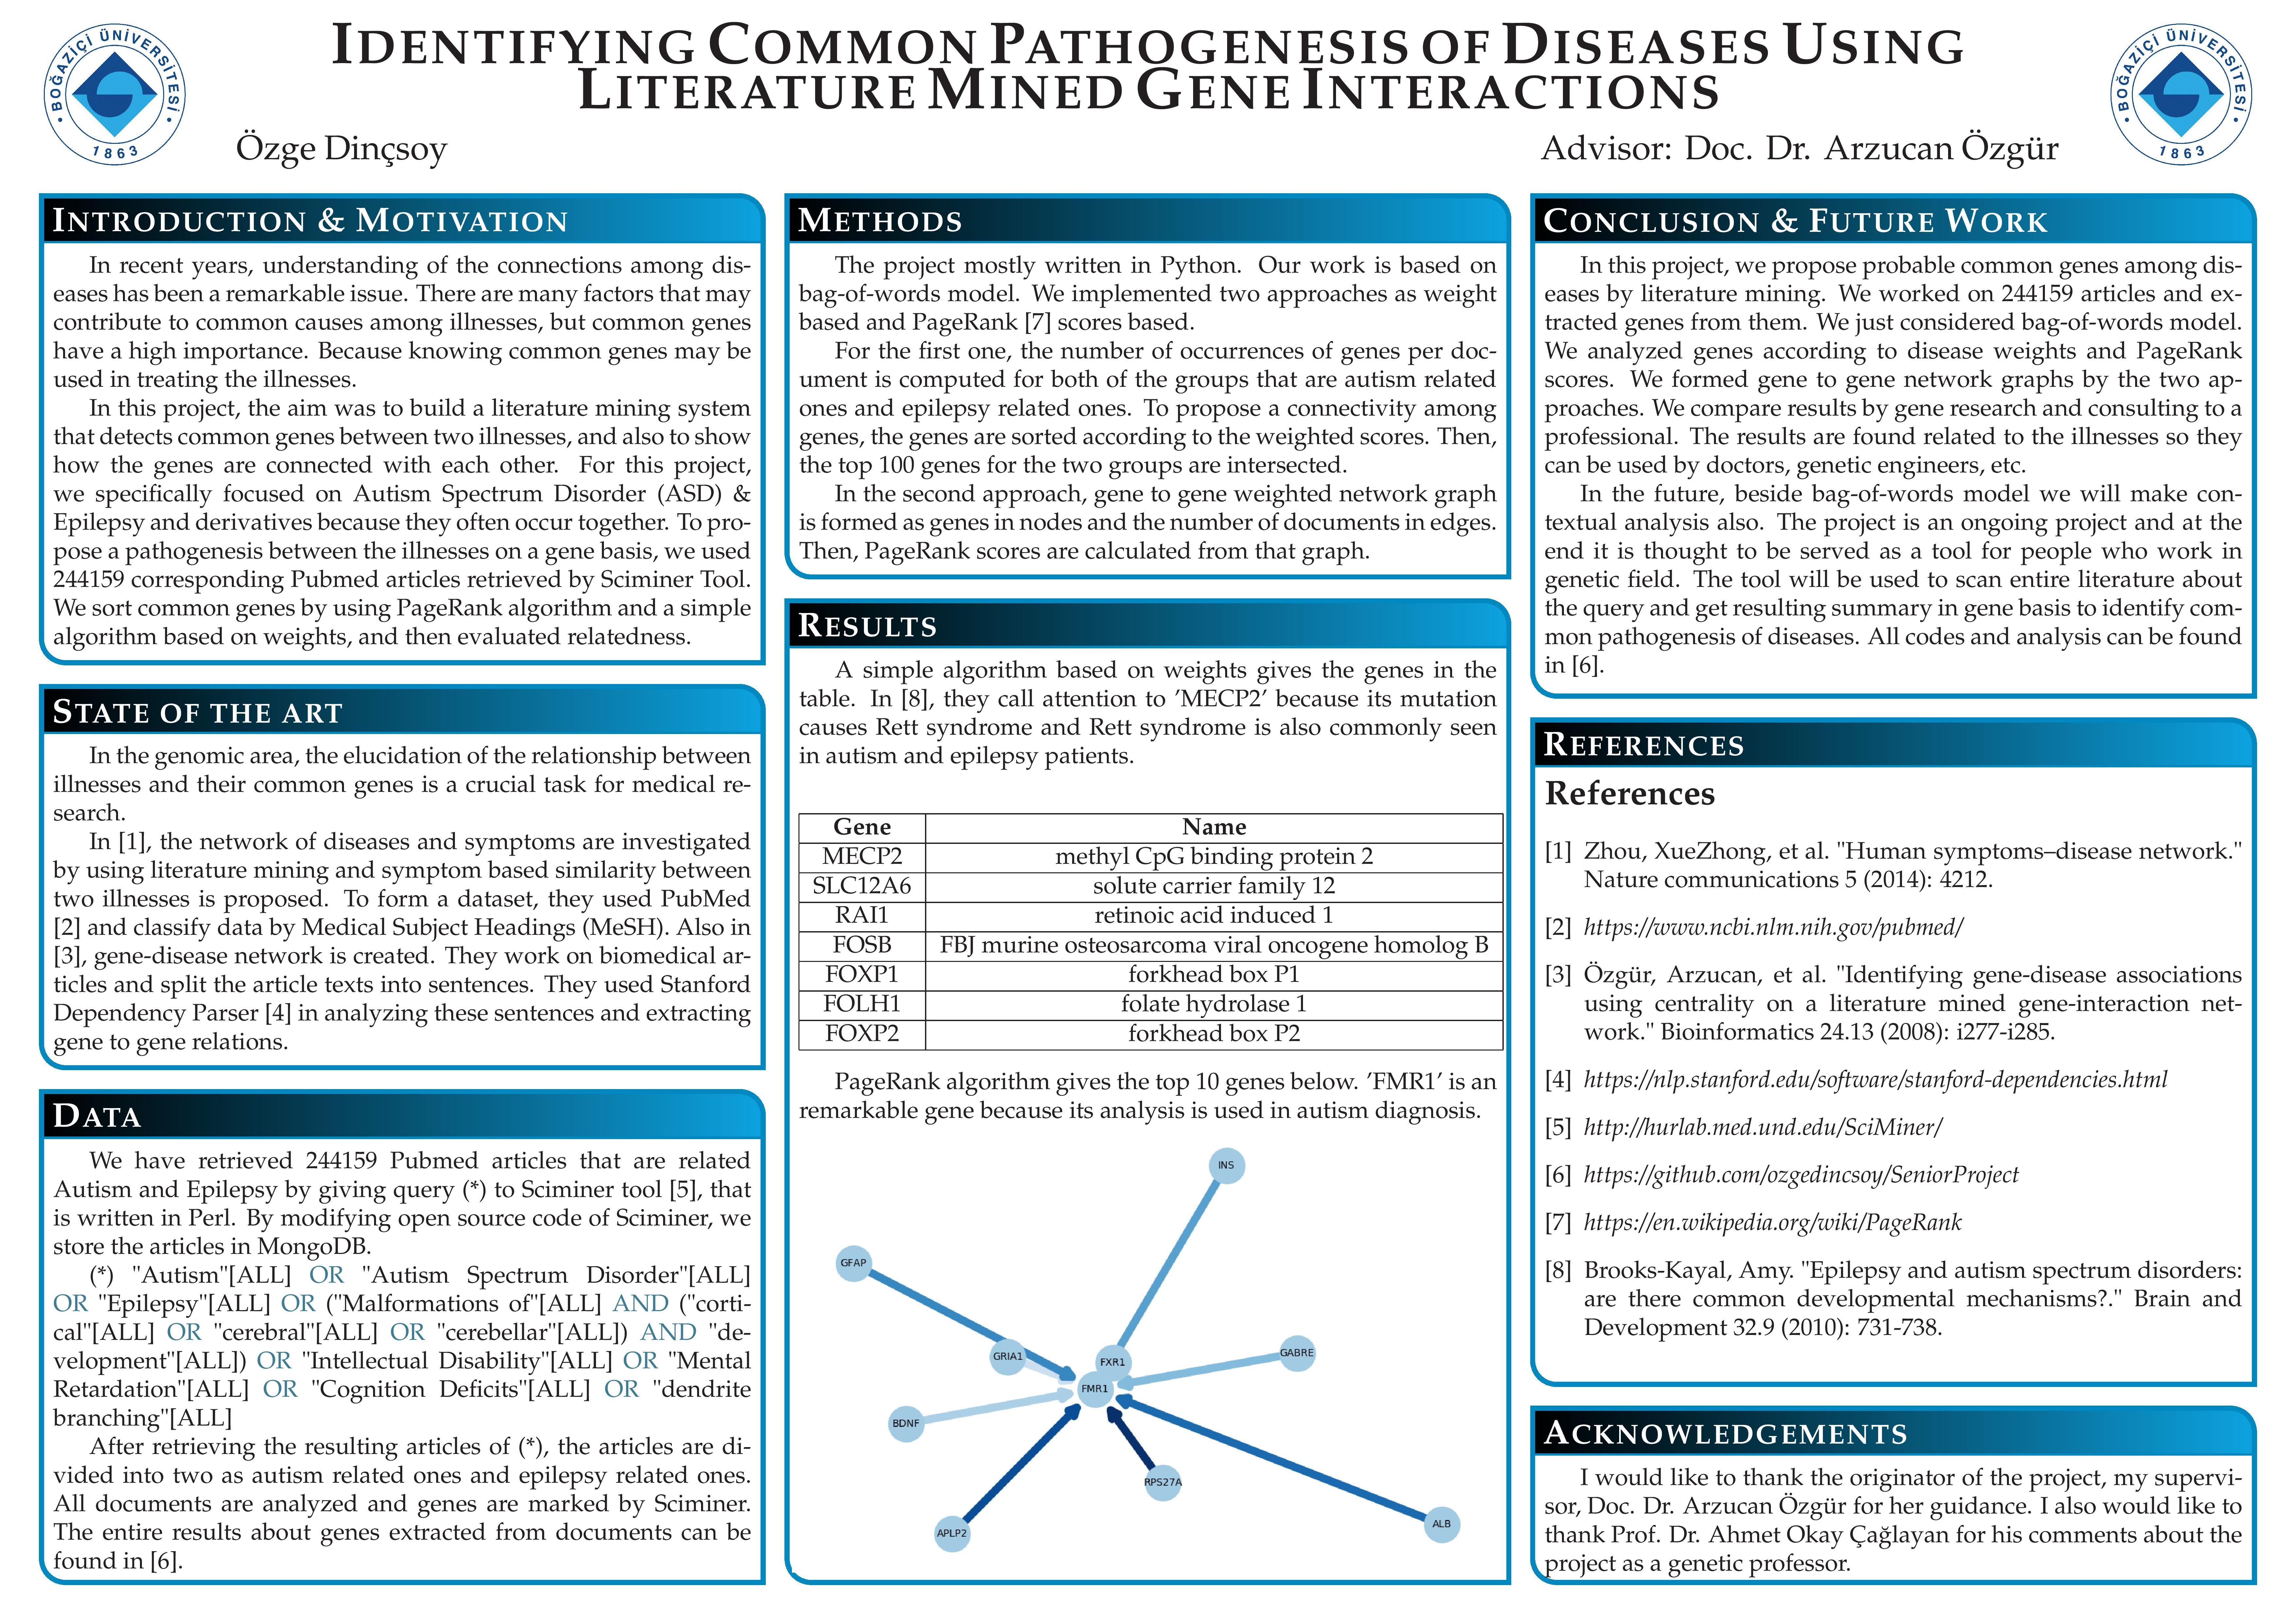 Identifying Common Pathogenesis of Diseases Using Literature Mined